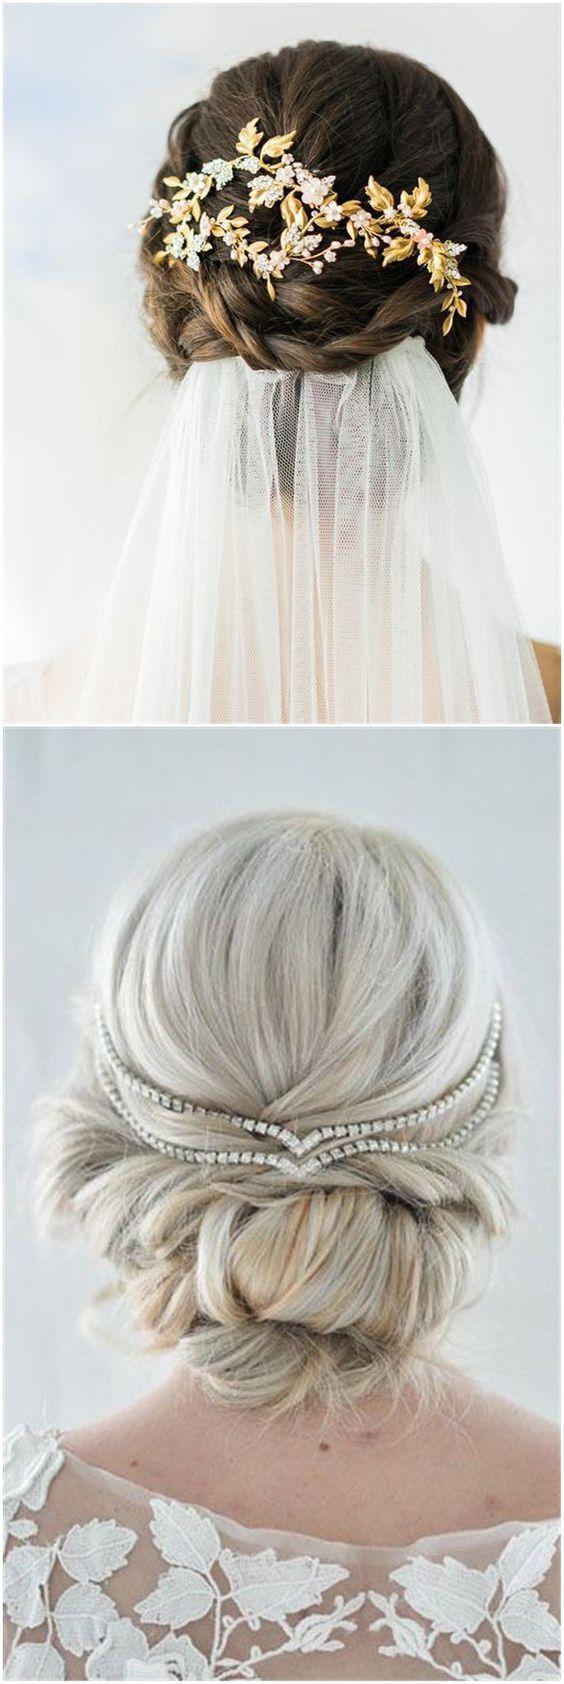 Wedding Hairstyles » Hair Comes the Bride – 20 Bridal Hair ...